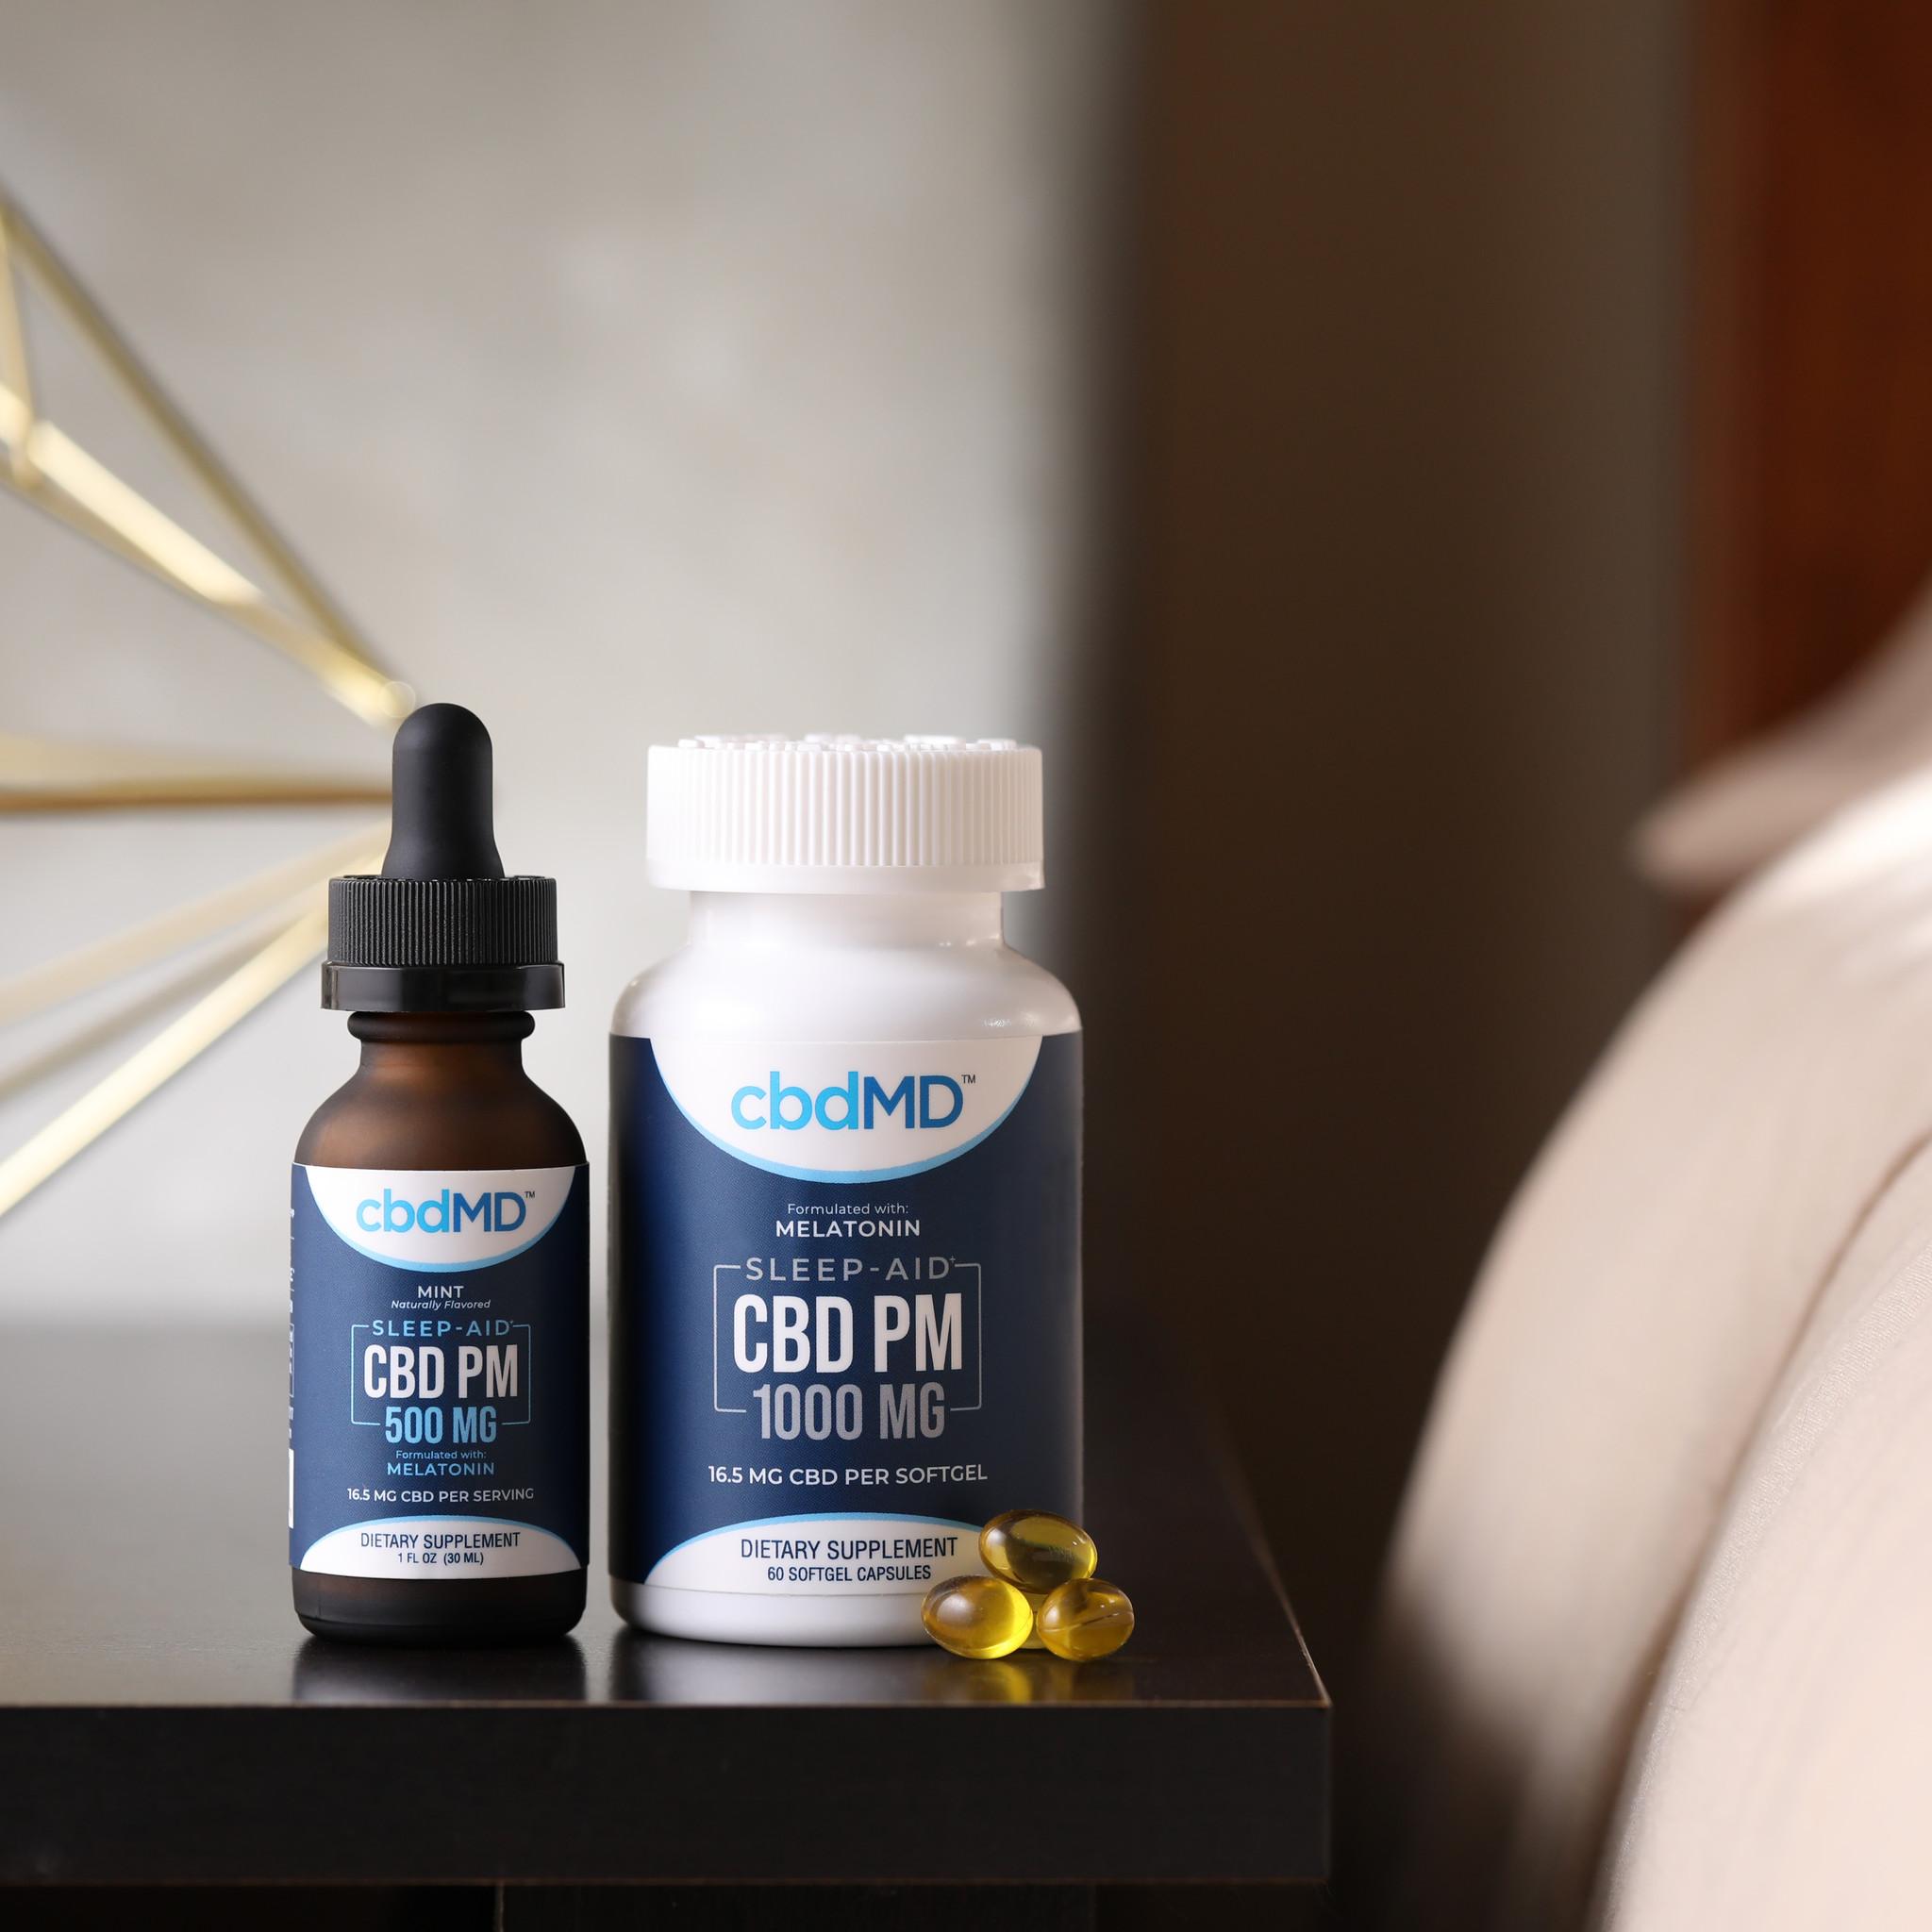 cbdMD | cbdMD FOR SLEEP | TINCTURES | 2 LEVELS |